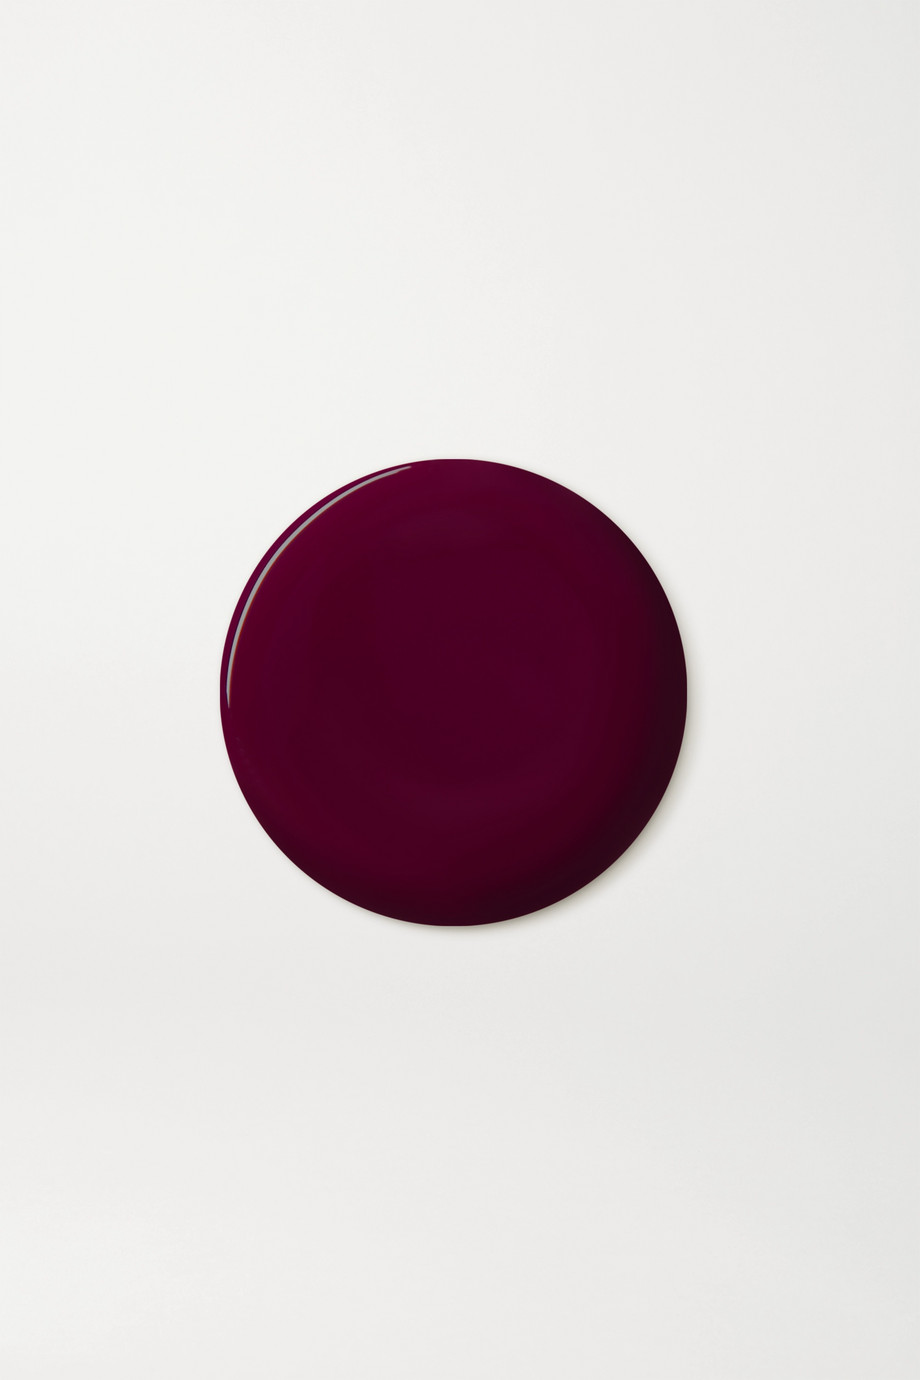 Christian Louboutin Beauty Matte Nail Color - Patibaba